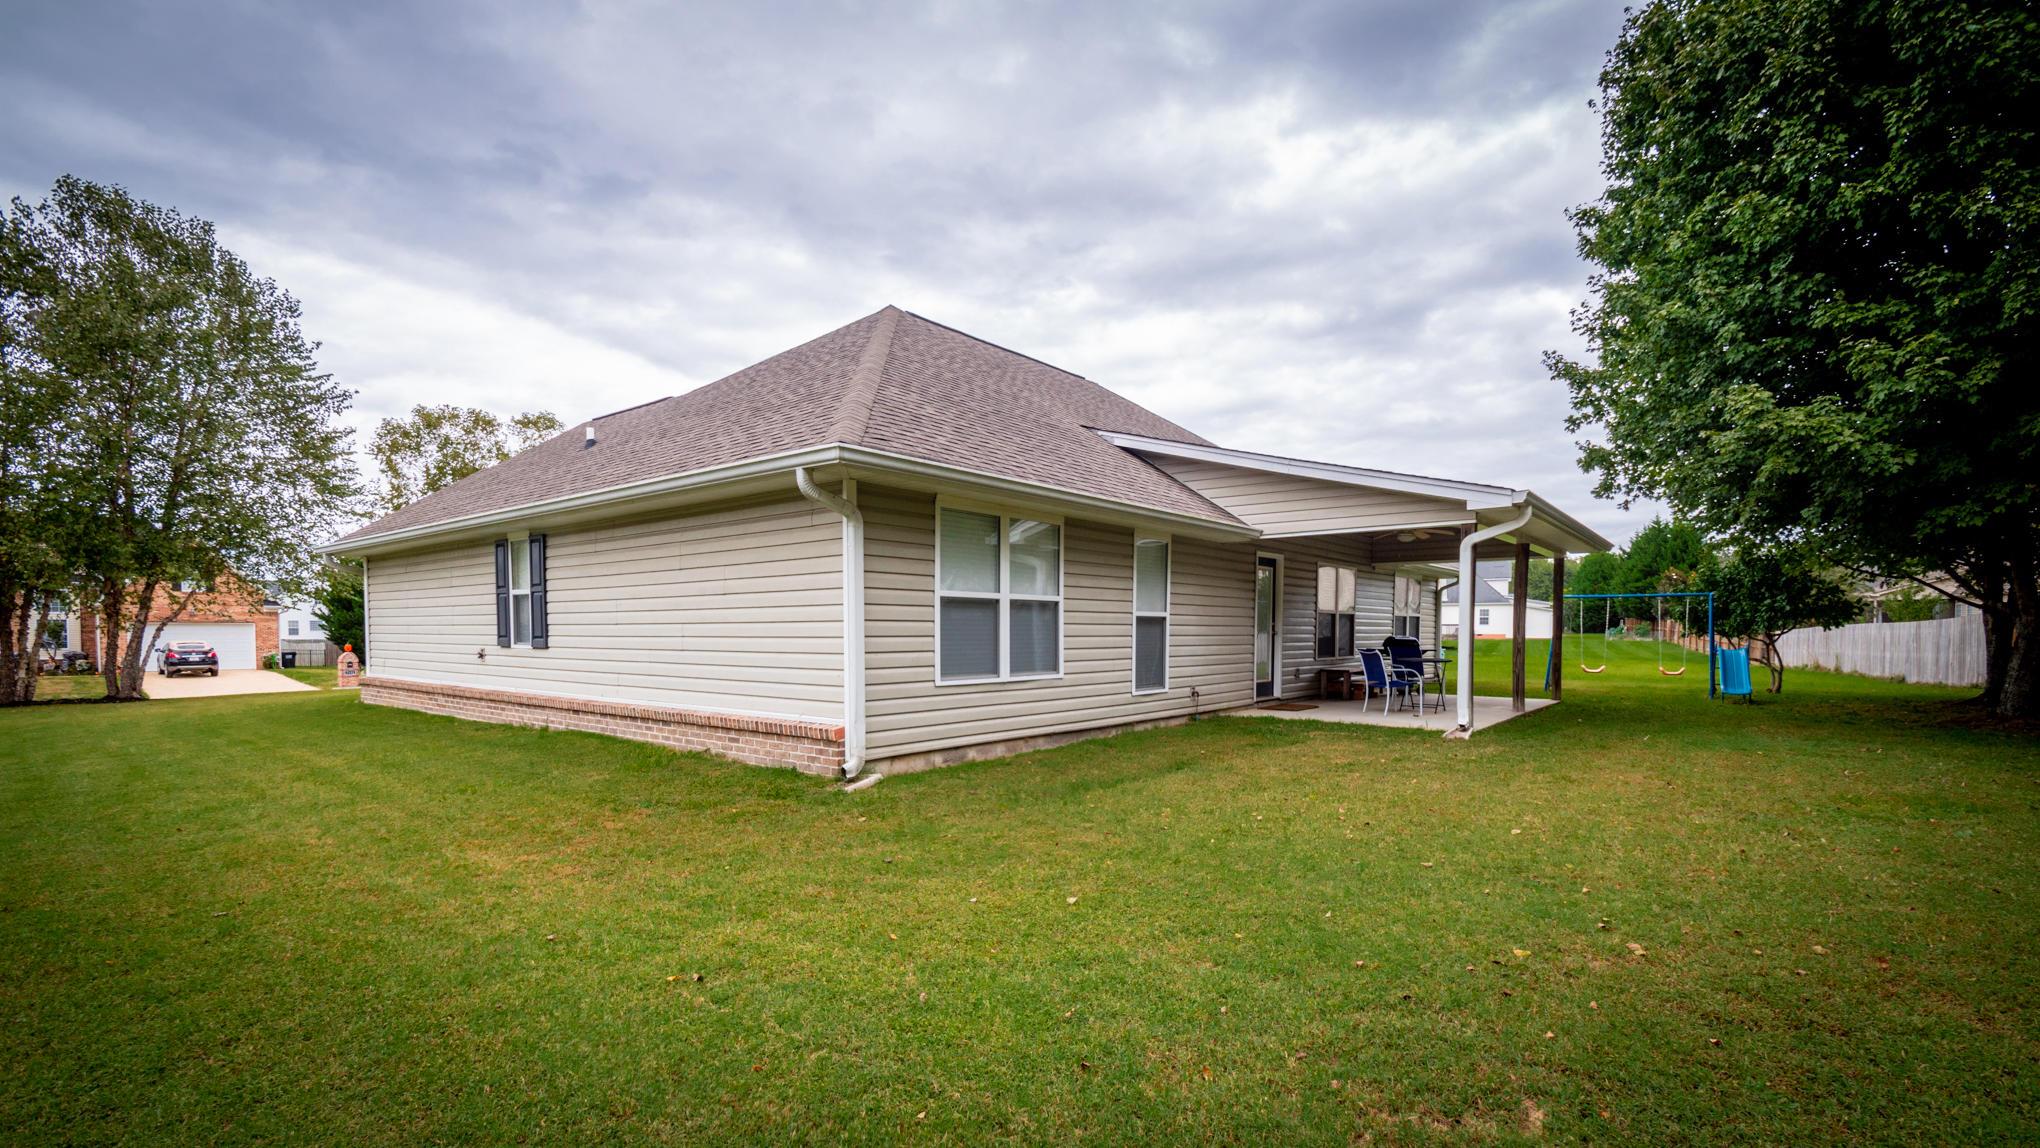 7134 Meredith Ct, Ooltewah, TN 37363